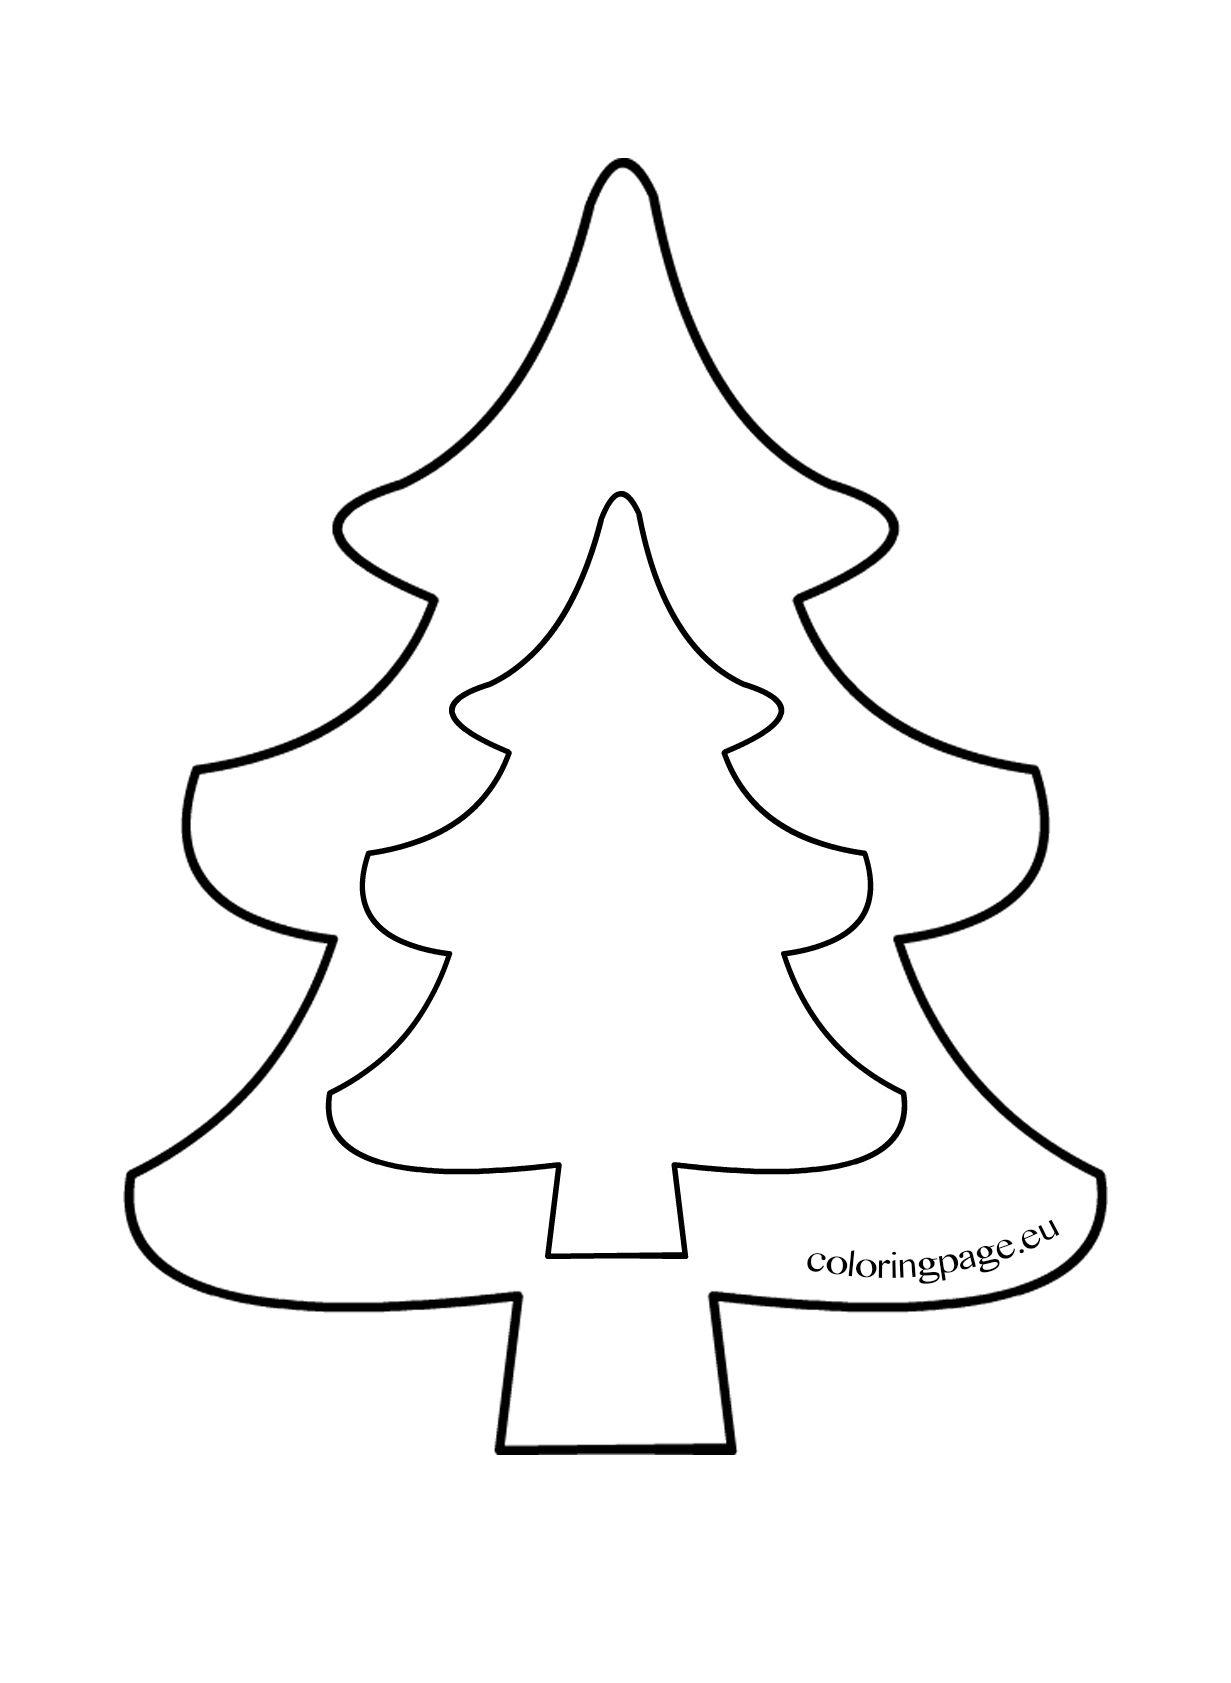 christmas tree template to print kar csony christmas pinterest weihnachtsb ume drucken. Black Bedroom Furniture Sets. Home Design Ideas